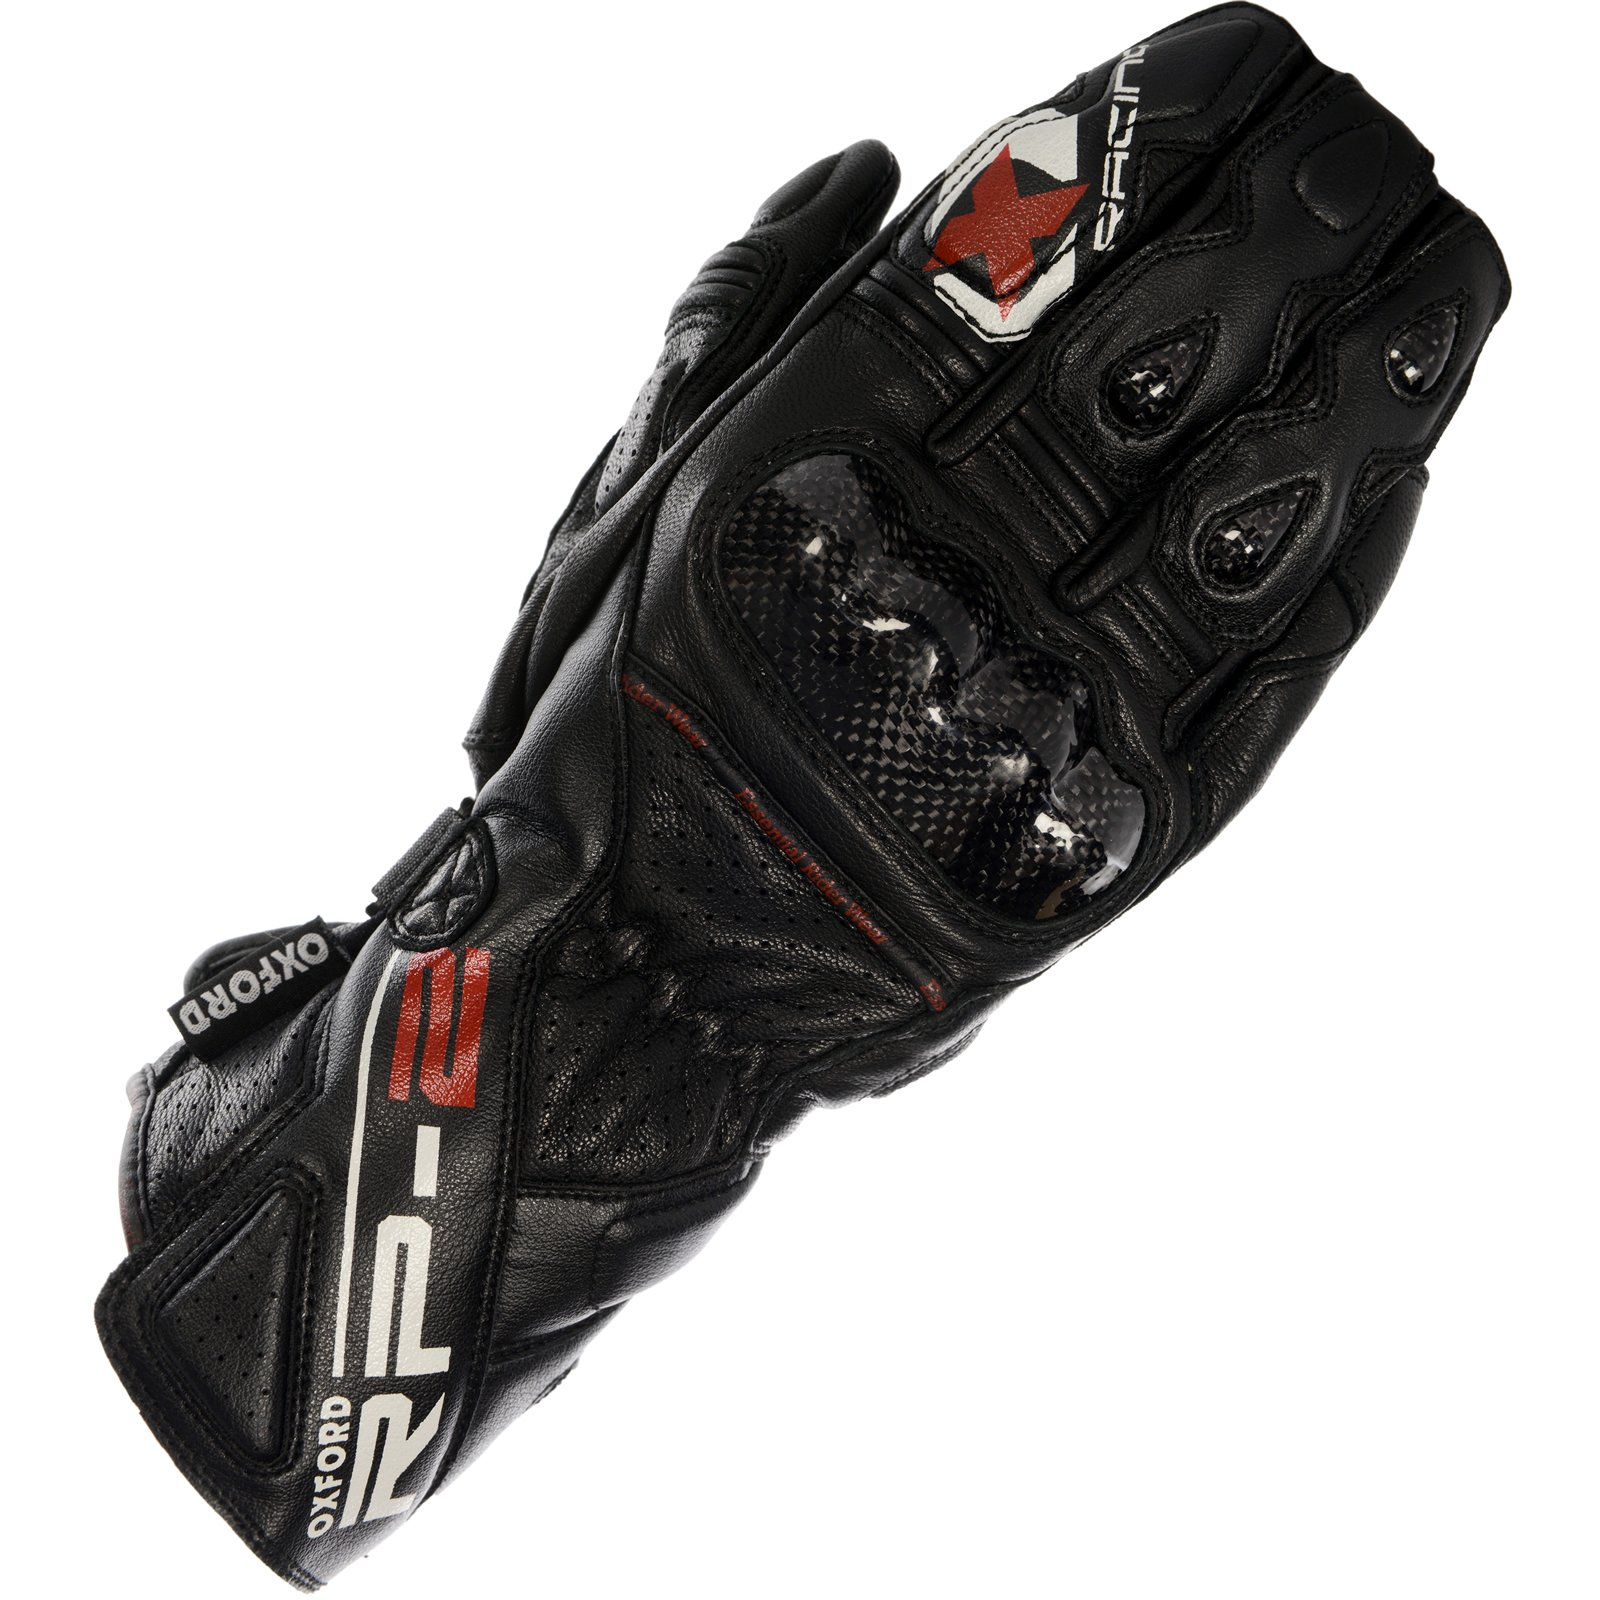 Oxford Unisex-Adult RP-2 Leather Race Gloves (Tech Black, Medium)